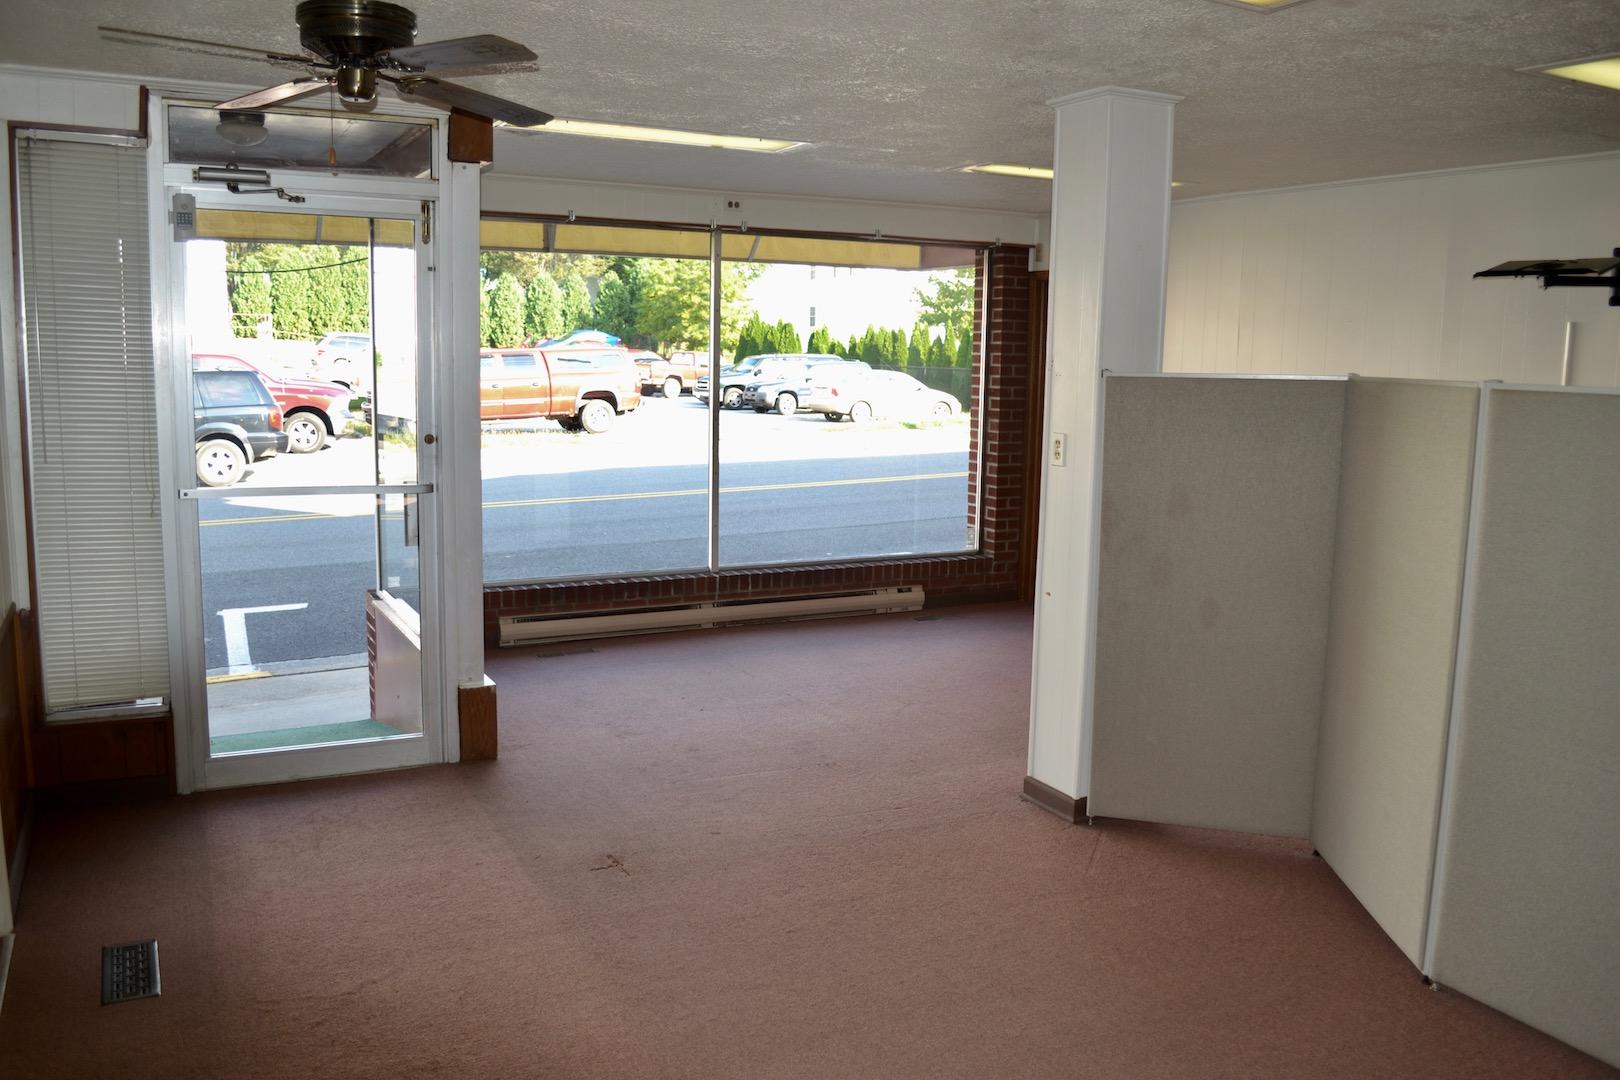 13-First Floor-Main Office Space-7.jpg